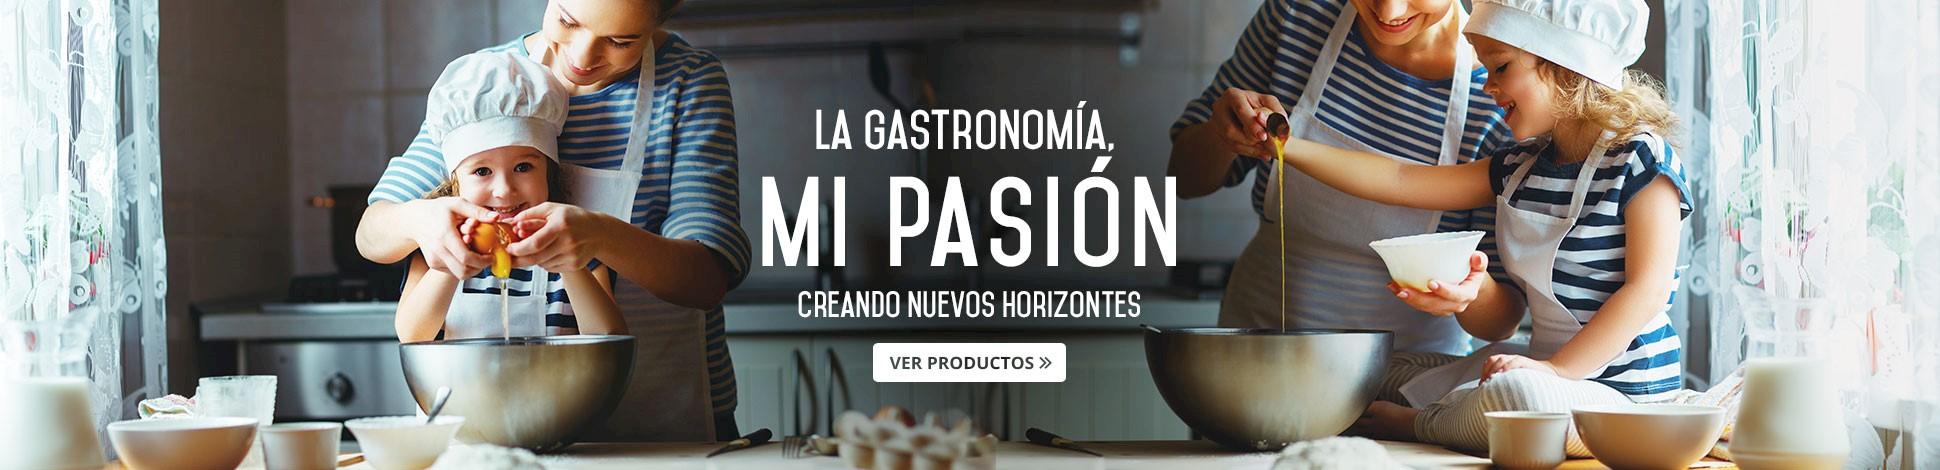 1940x470-hs-gastronomia-pasion-colombia.jpg